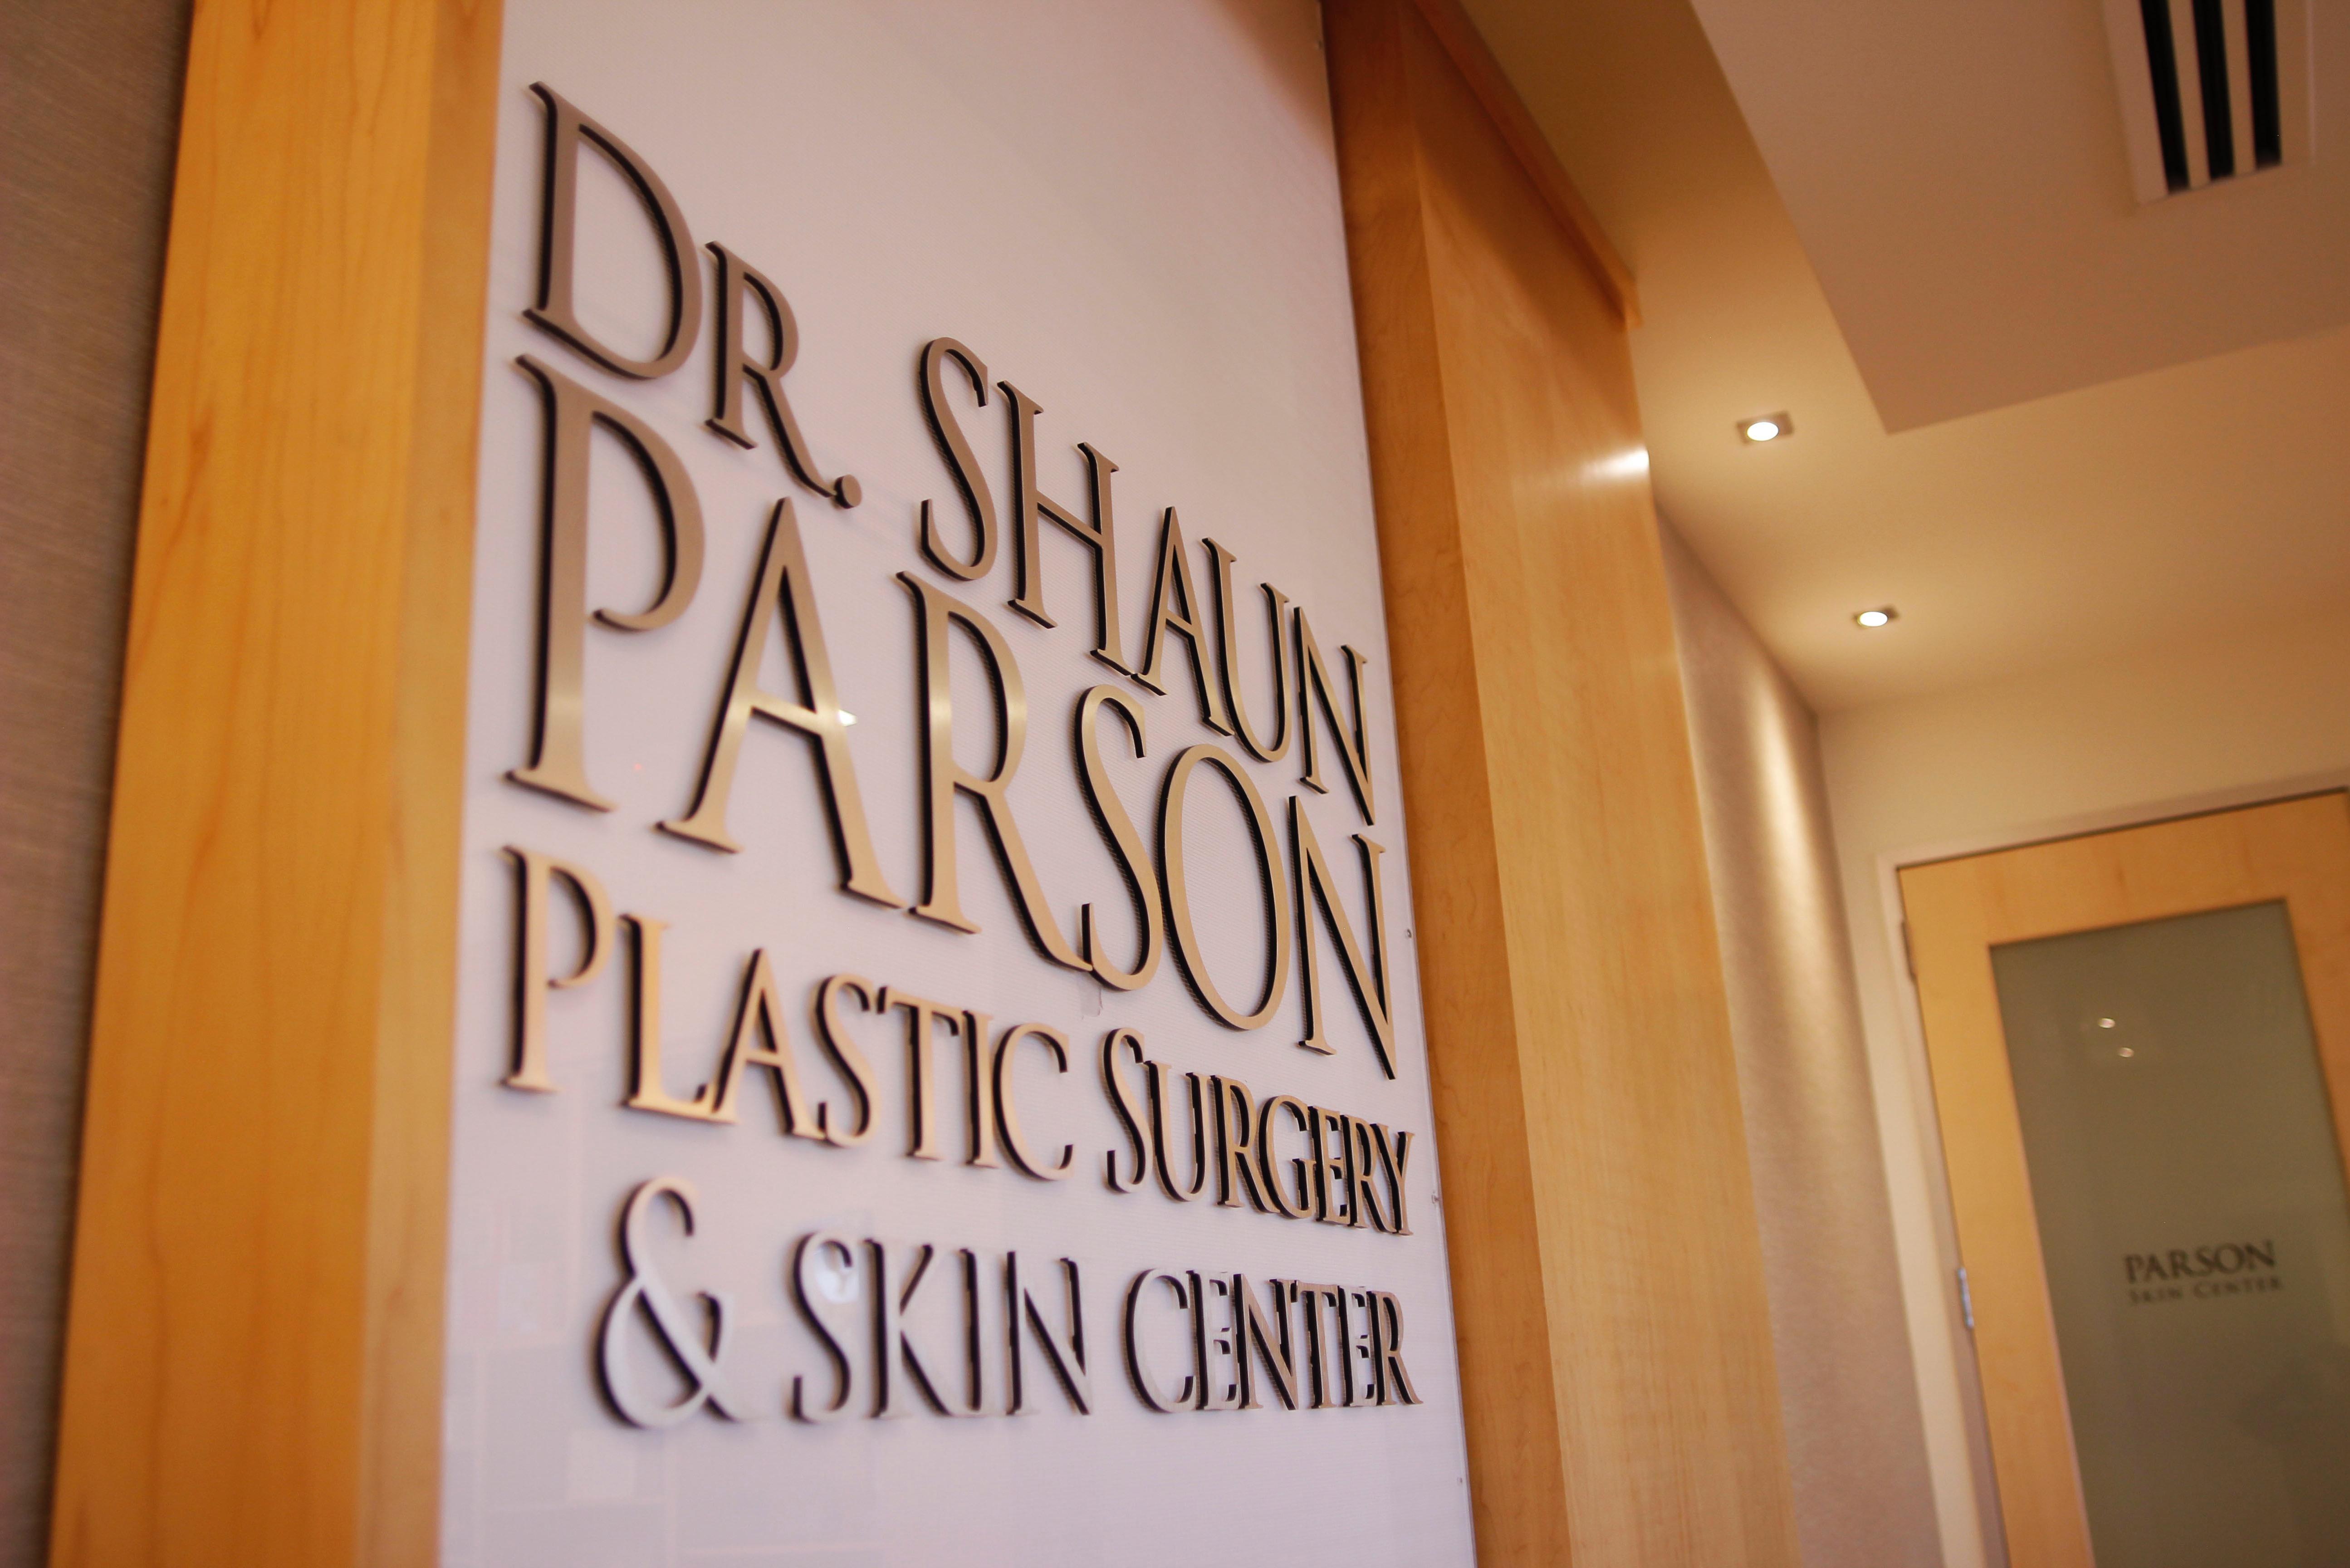 Dr. Shaun Parson Plastic Surgery and Skin Center image 1